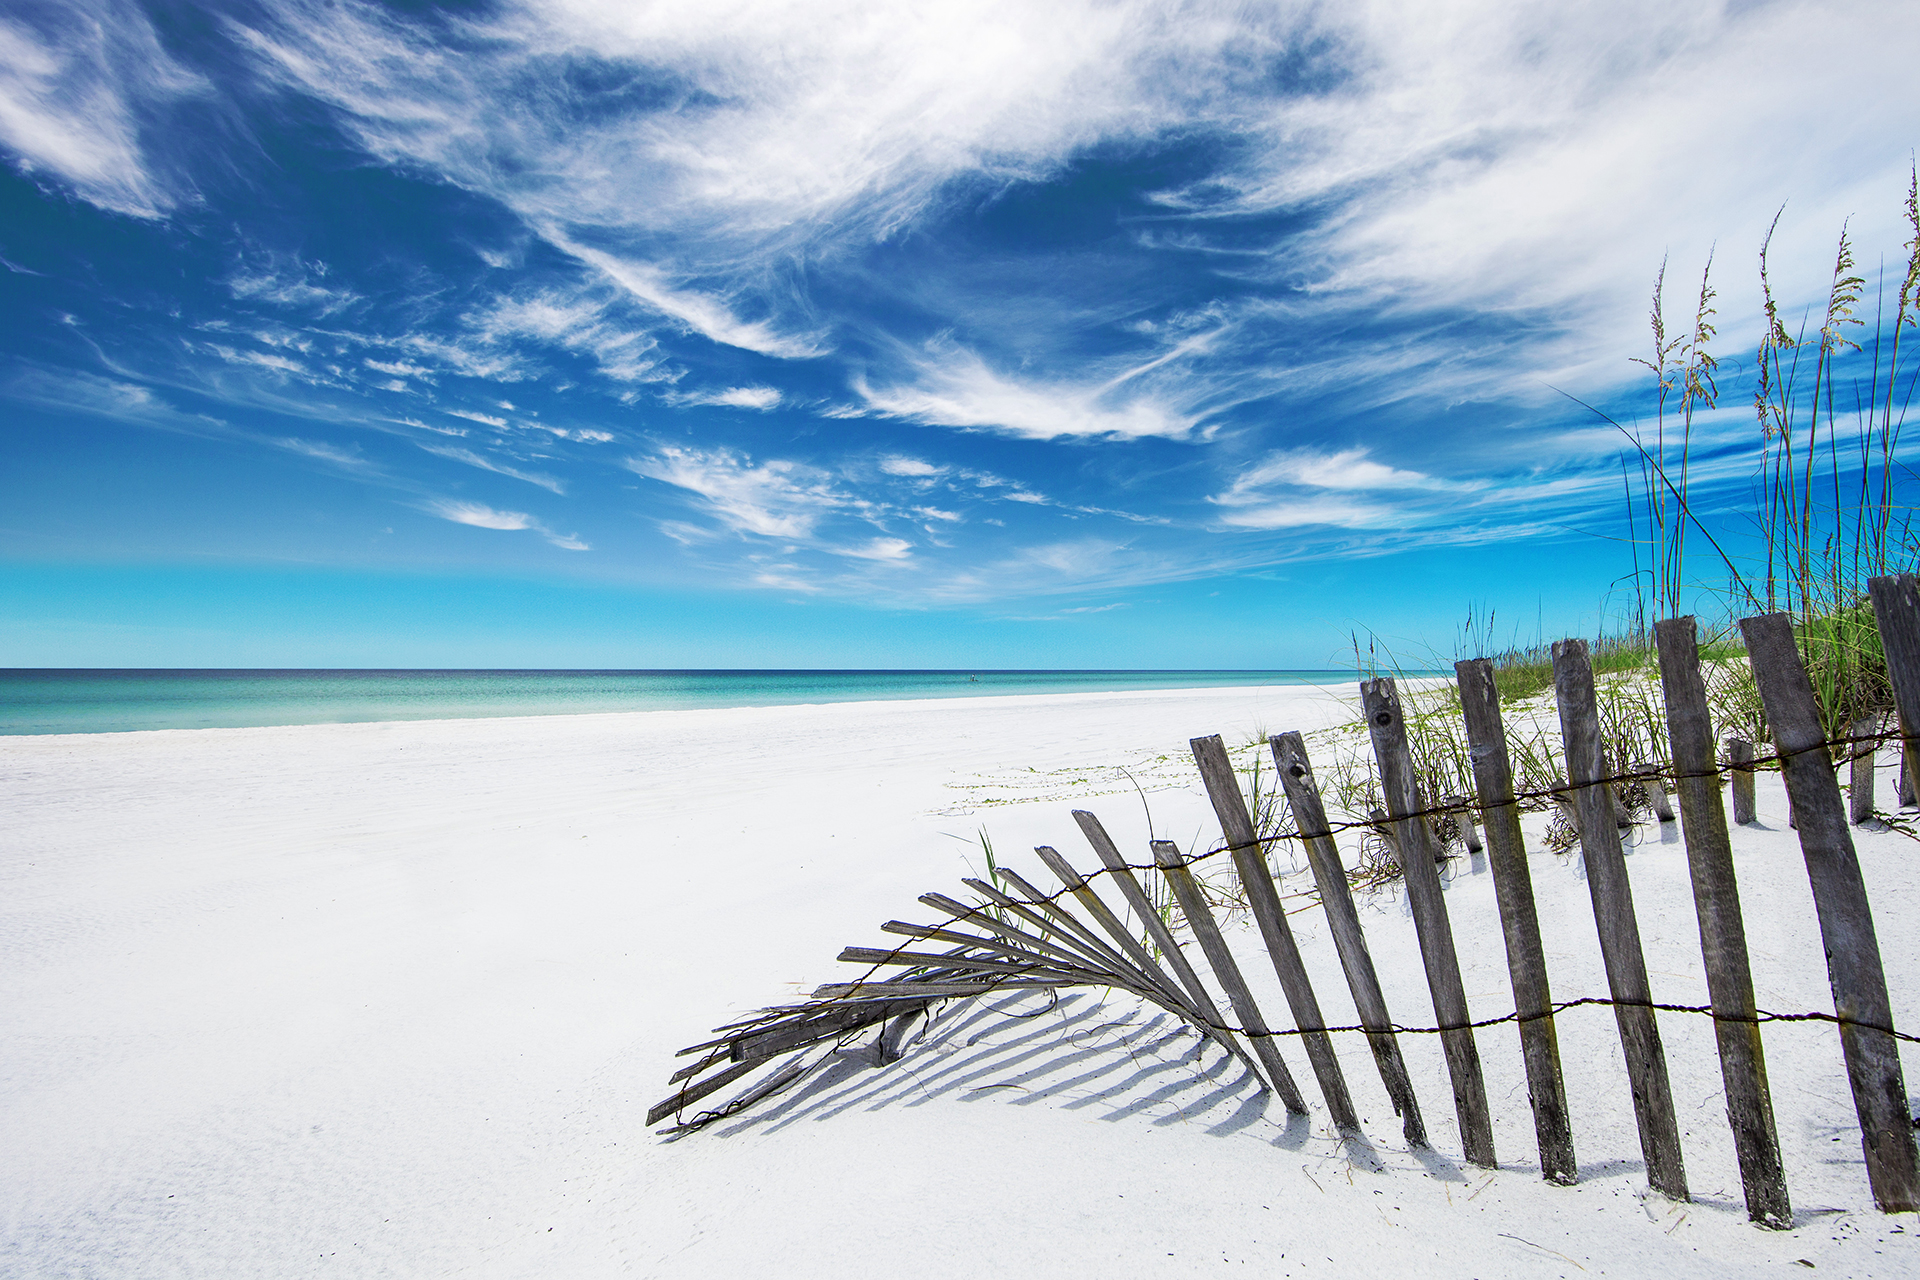 10 Secret Florida Vacation Spots You Never Knew About